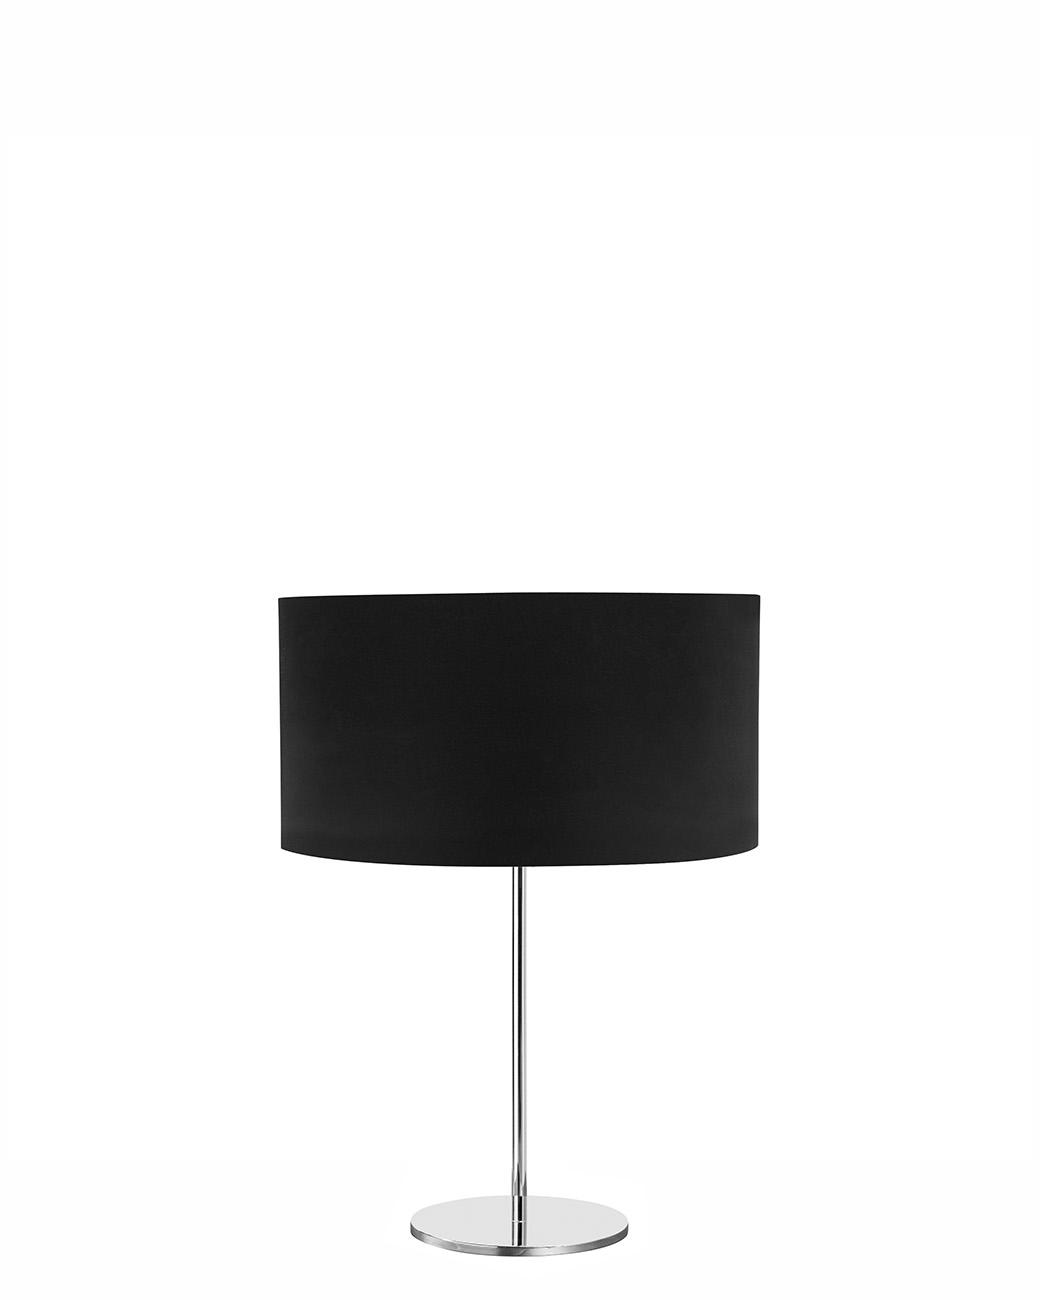 CM-0385 - Round